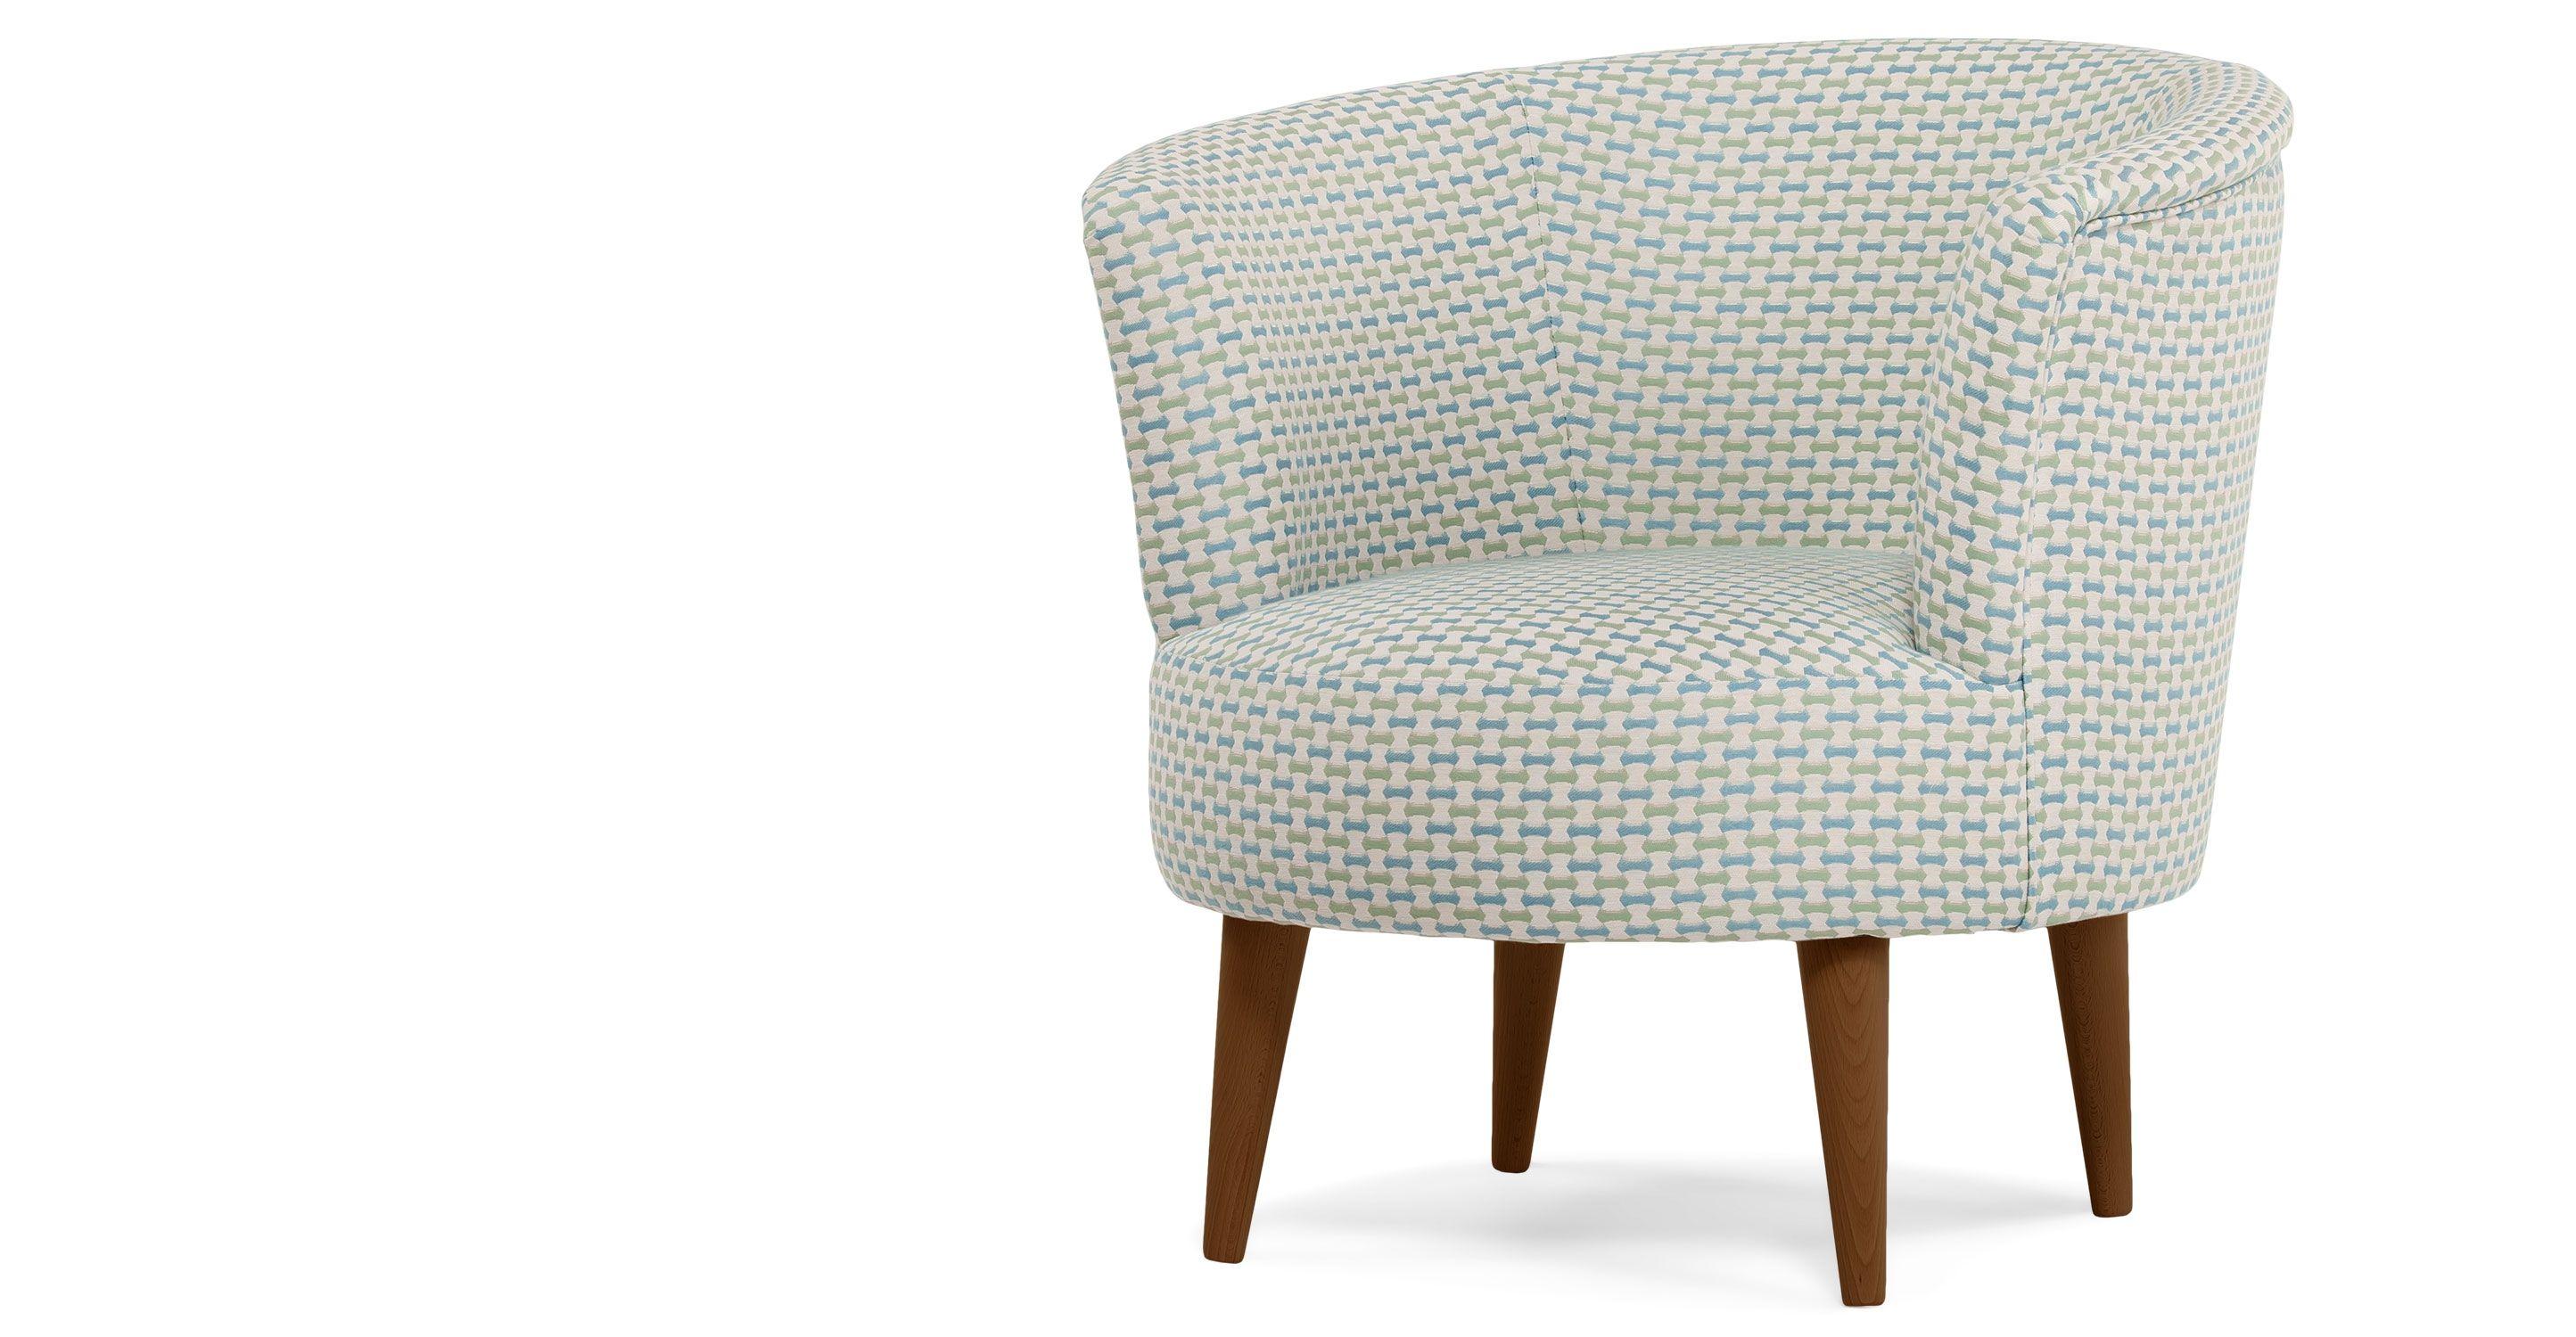 lulu design d 39 allegra hicks un fauteuil d 39 appoint tiss nid d 39 abeilles ma d co. Black Bedroom Furniture Sets. Home Design Ideas